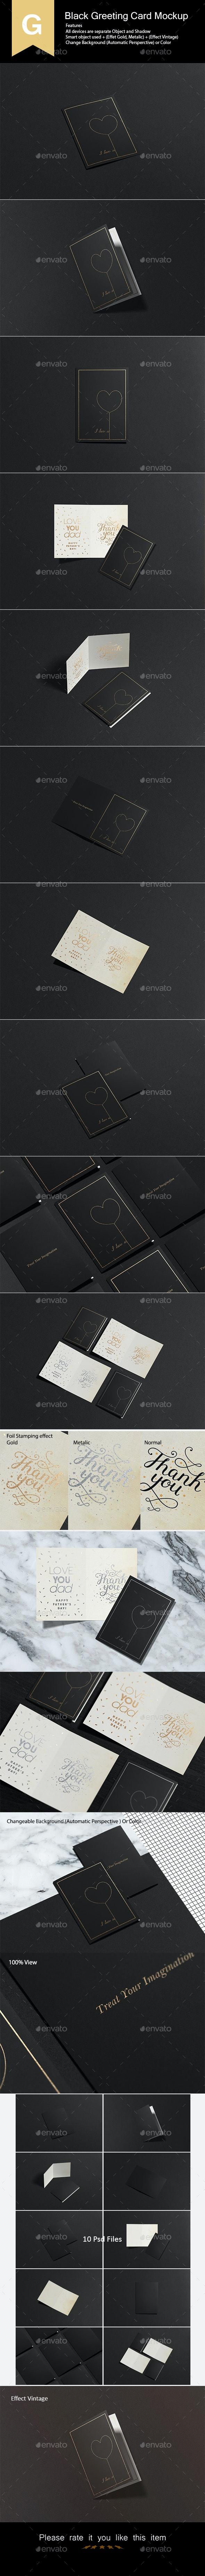 Black Greeting Card Mock-Up - Product Mock-Ups Graphics